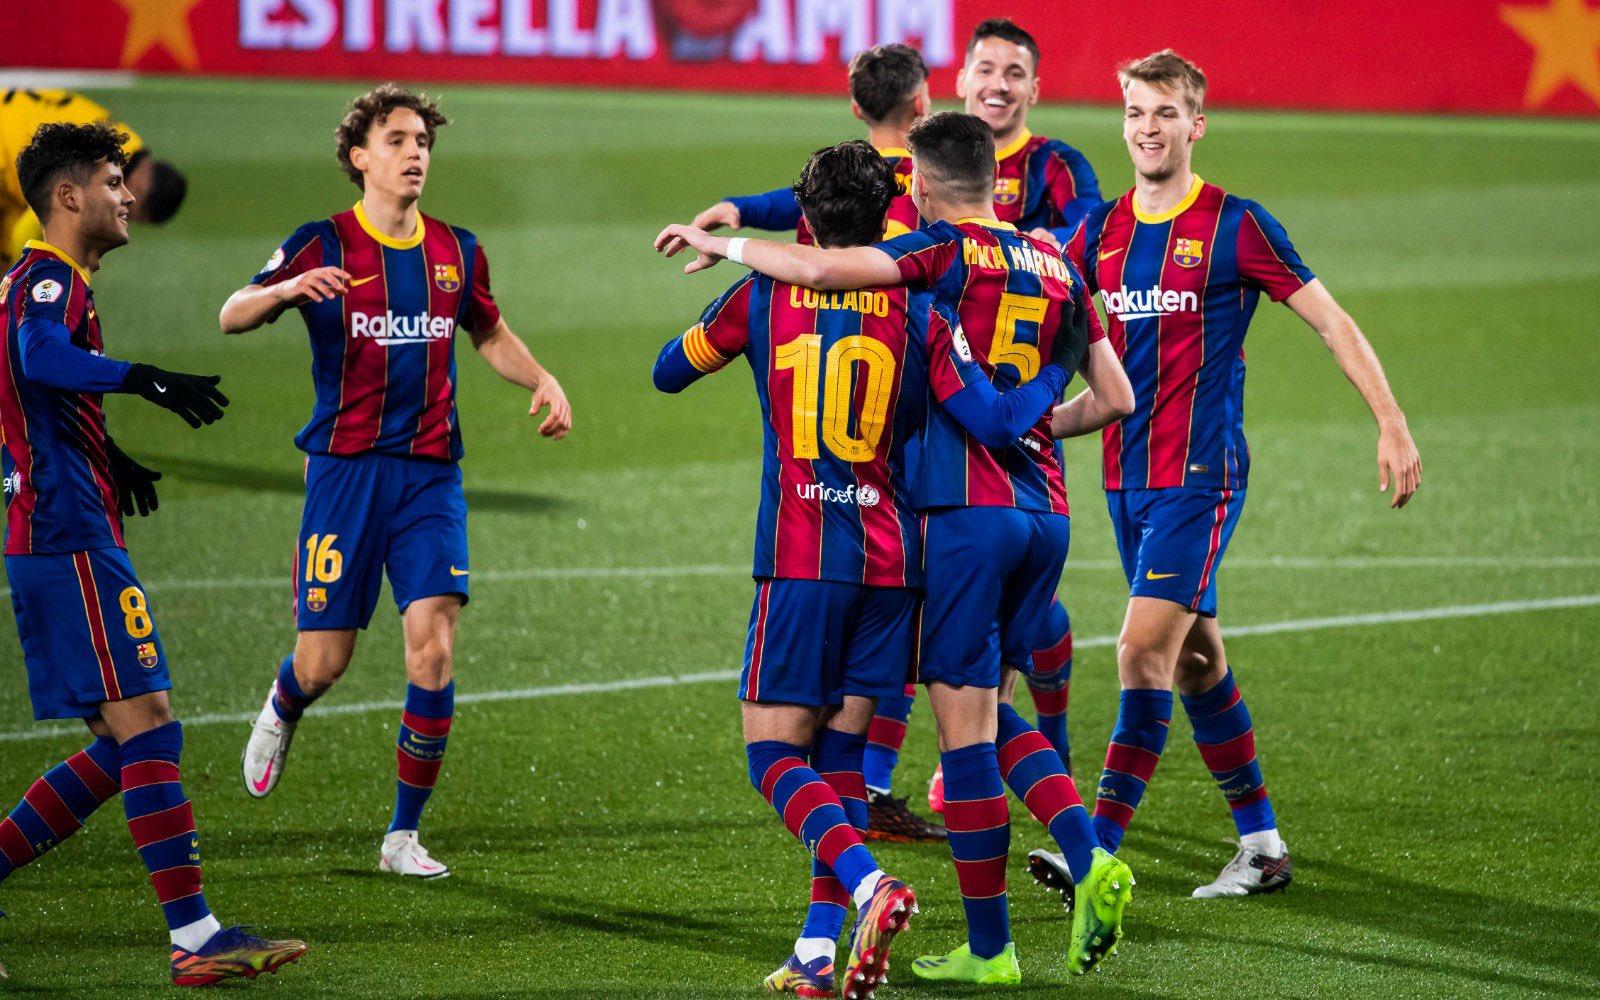 Highlights | Barça B 4 v 0 Badalona